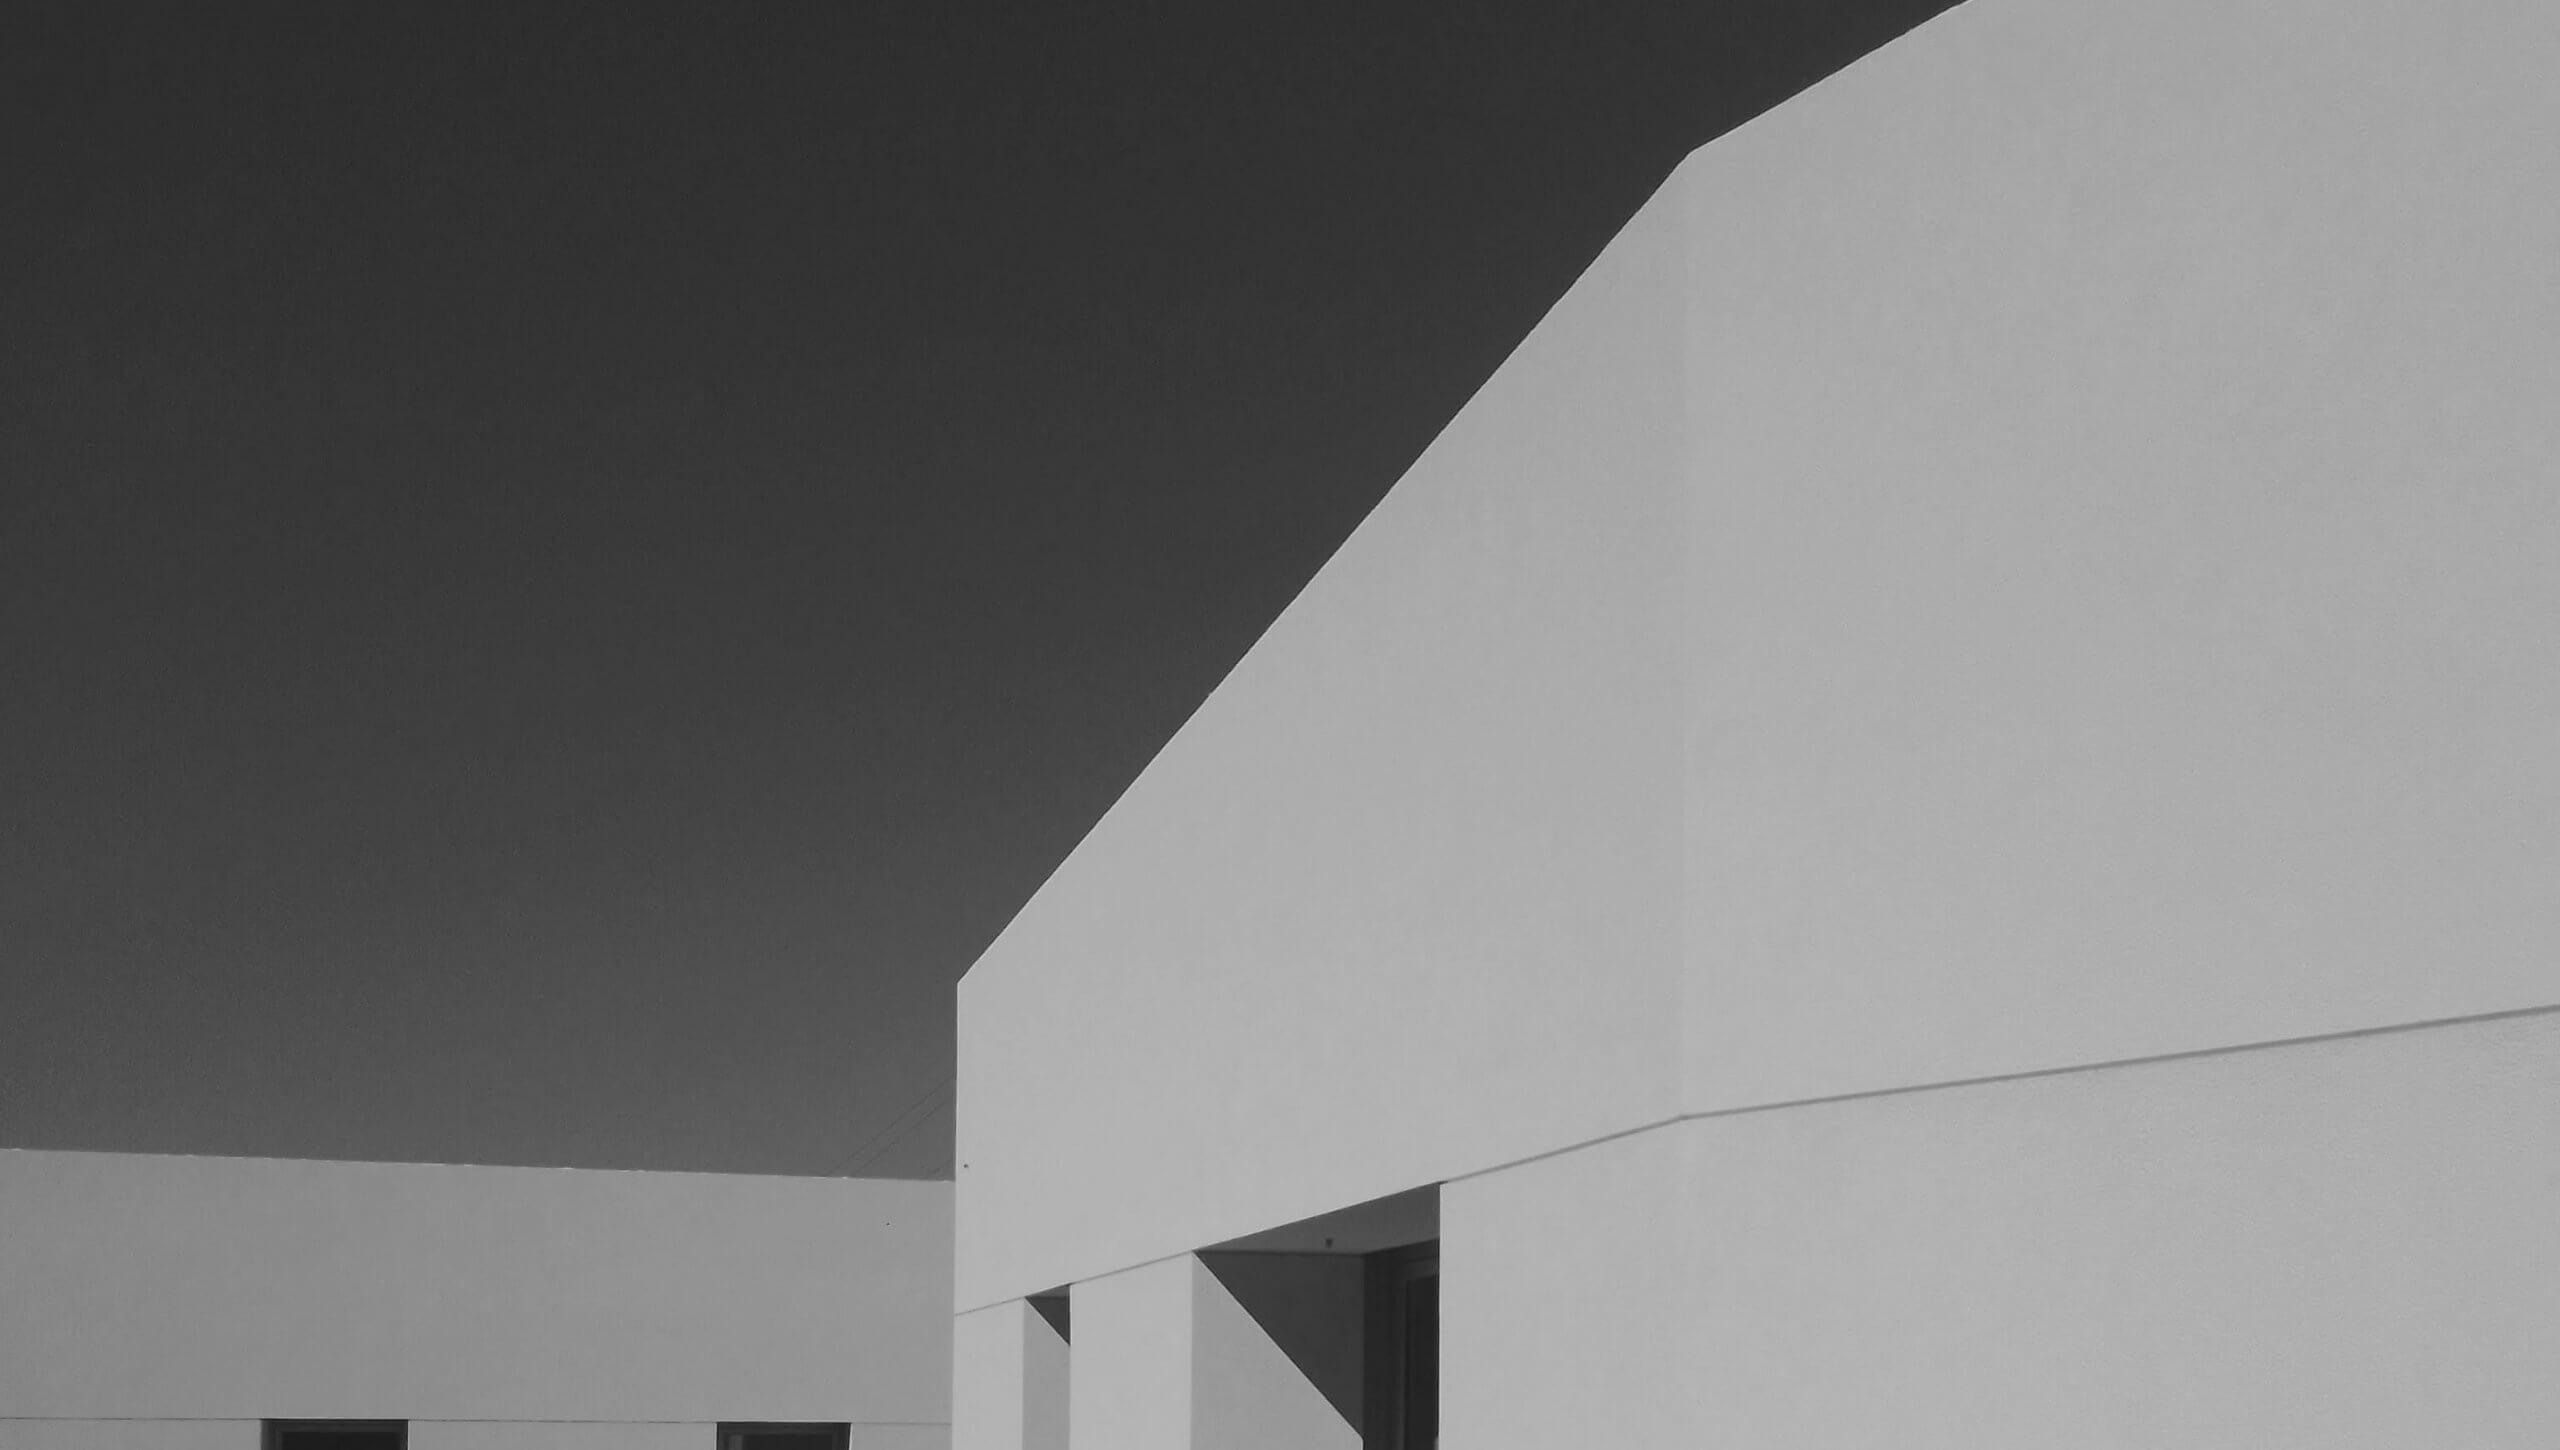 Ribeira_II_content